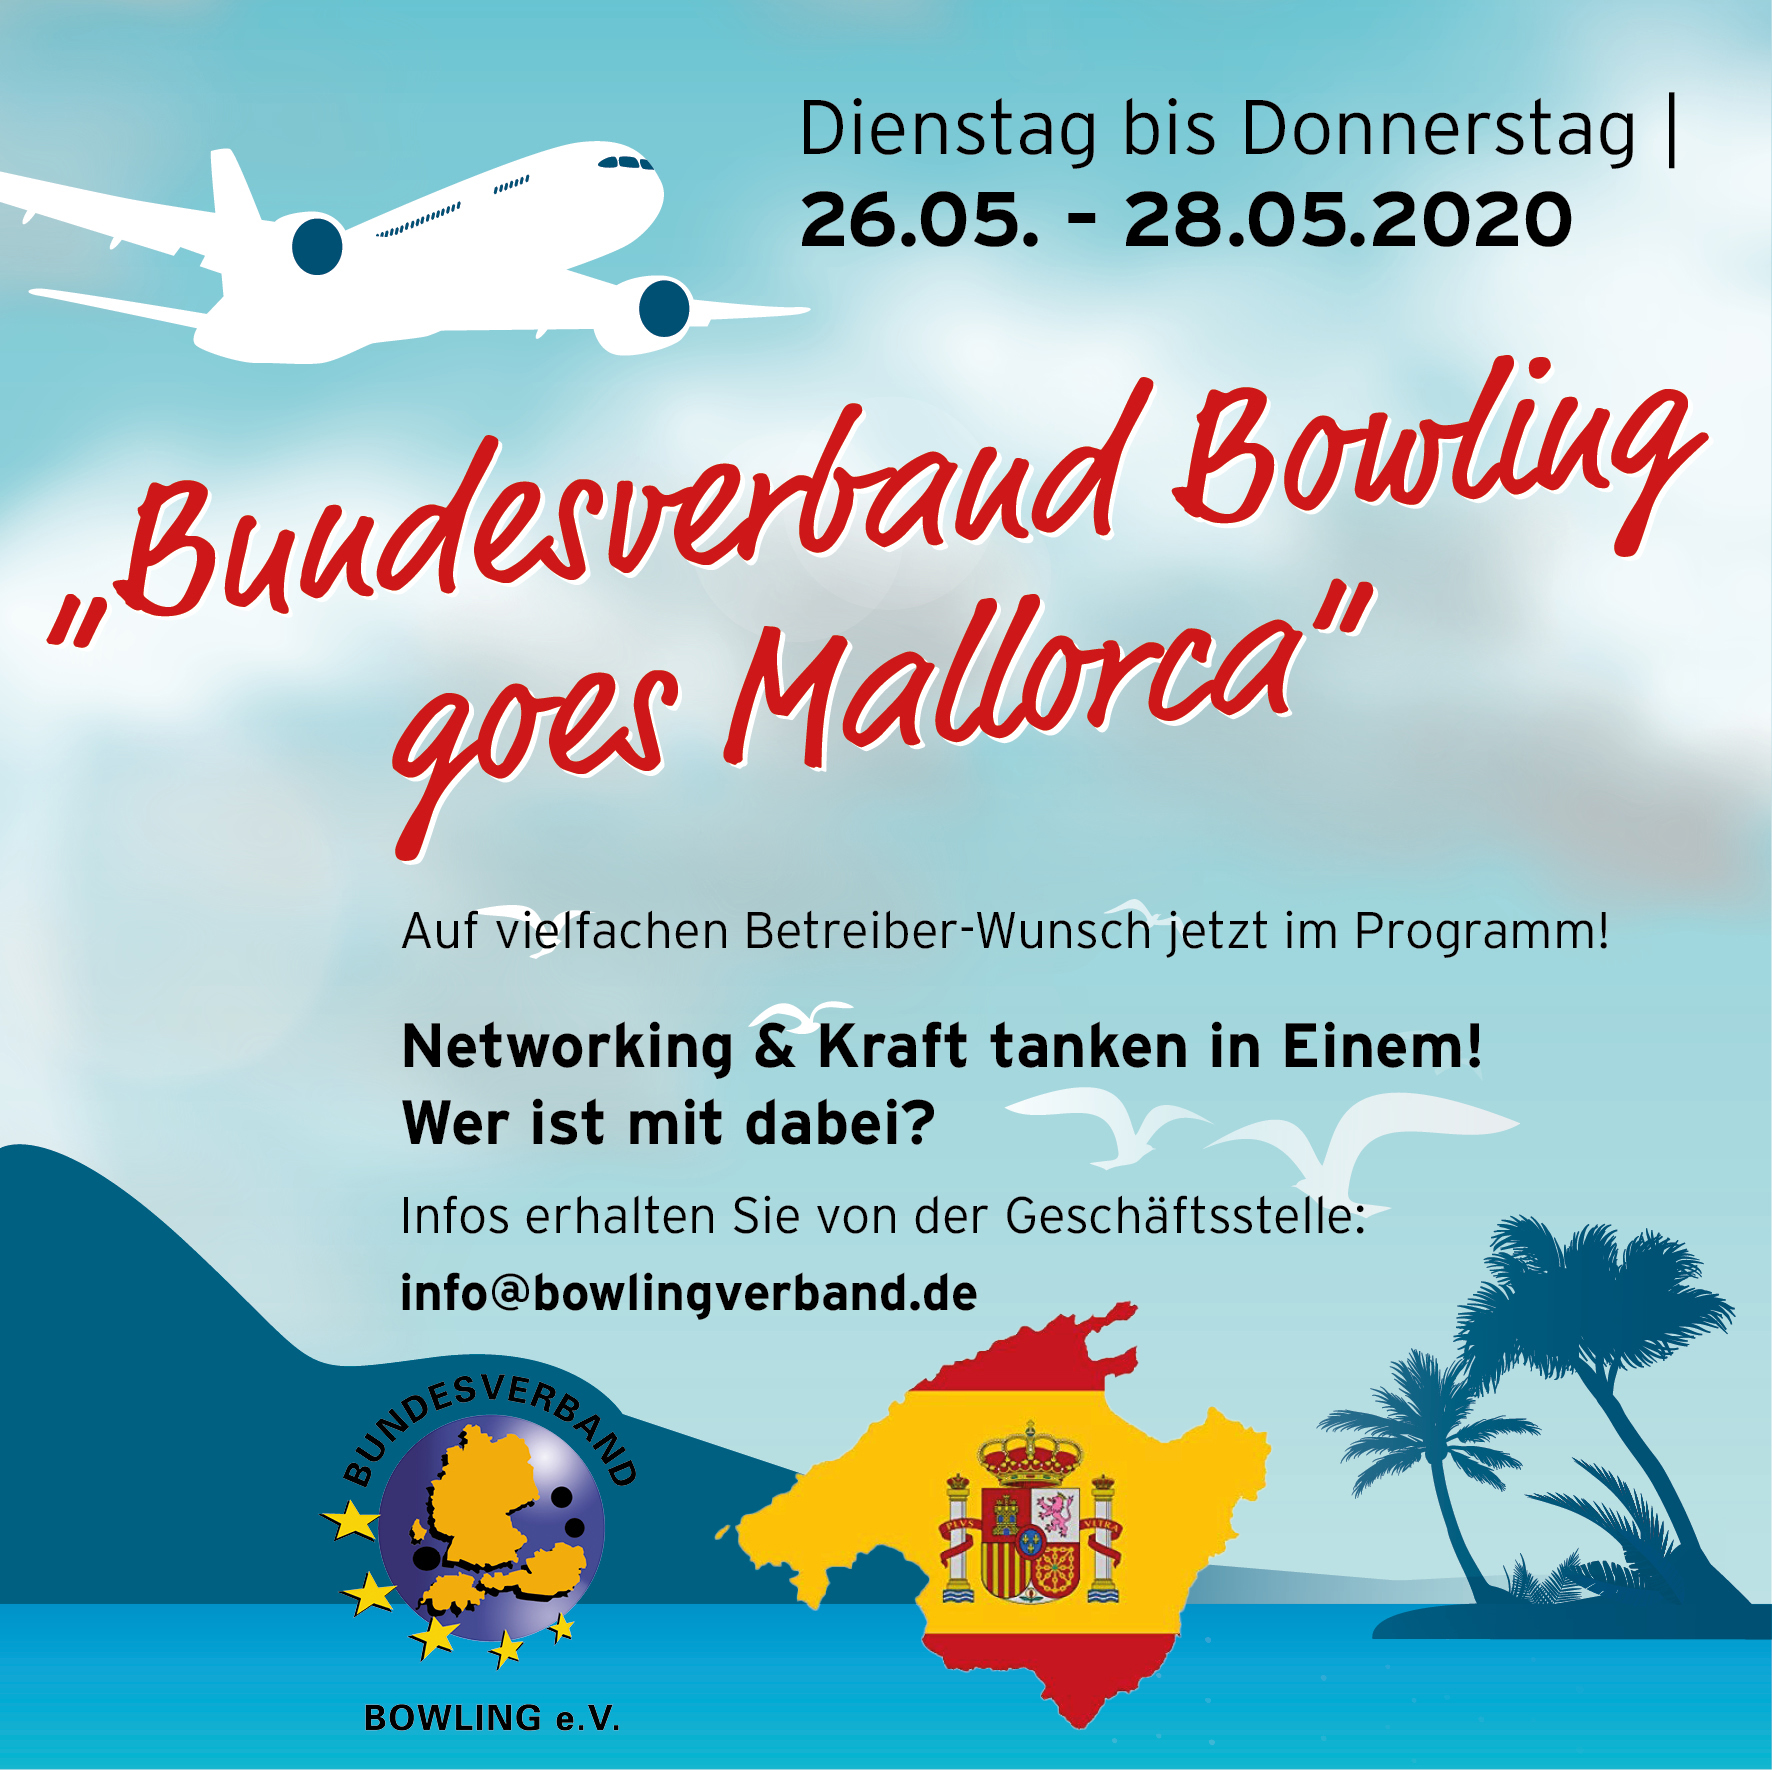 BVB goes Mallorca 2020